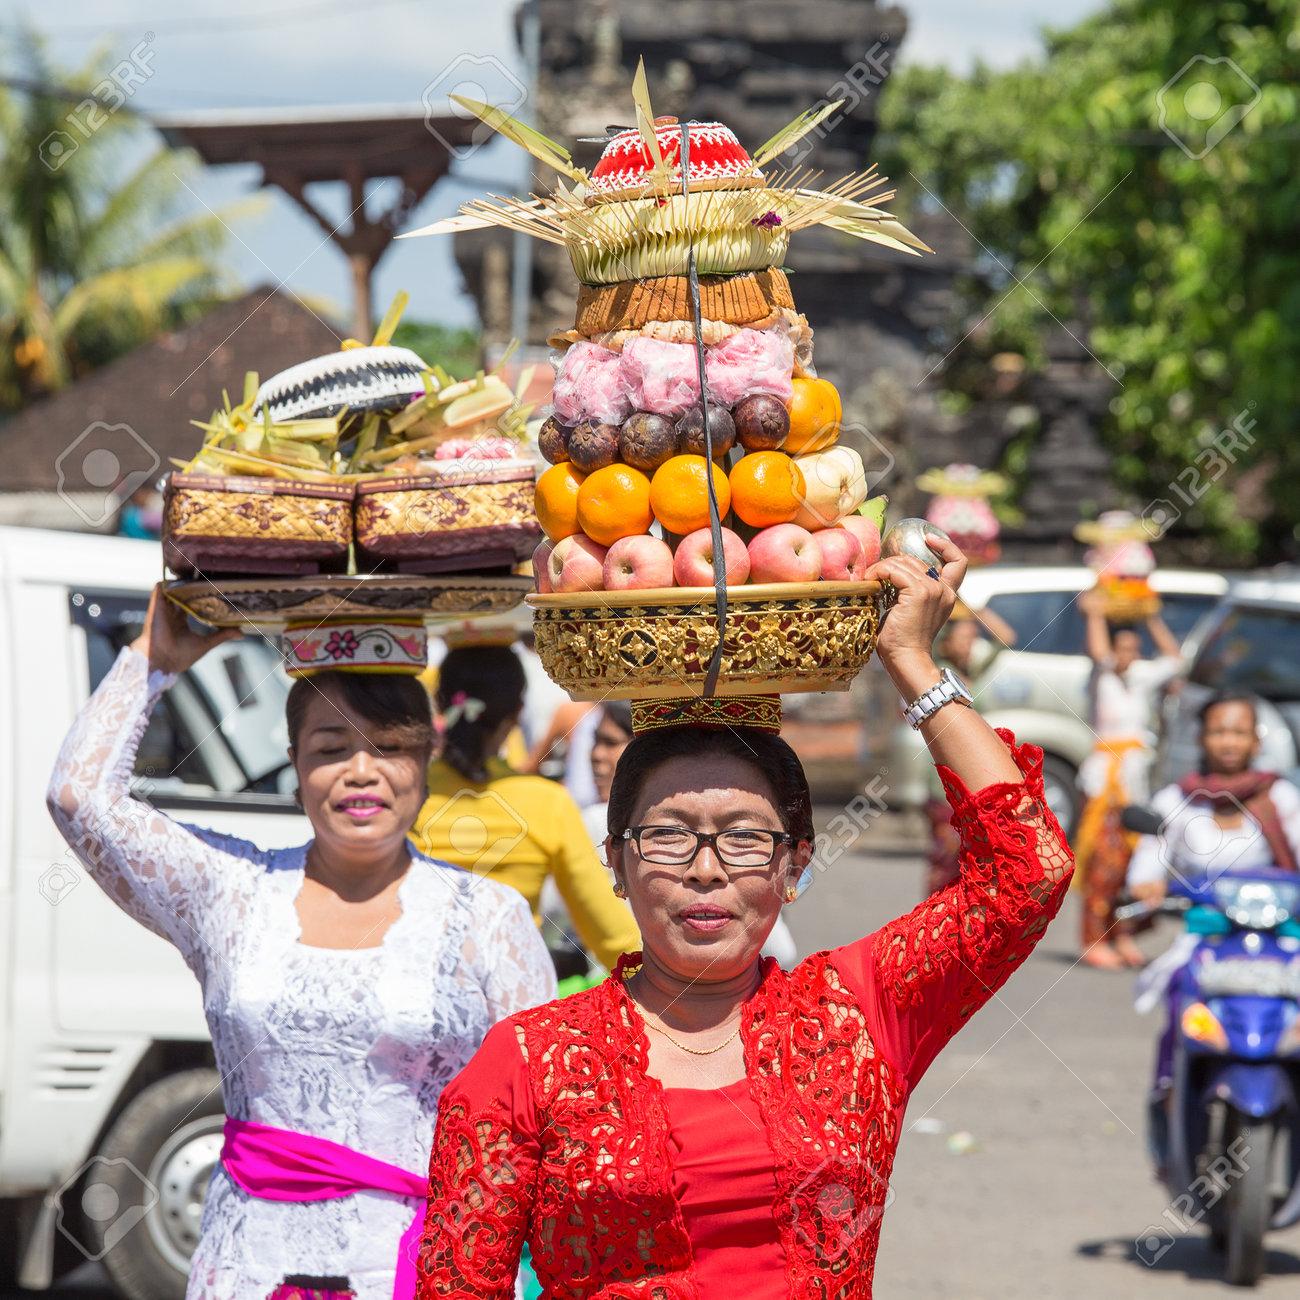 Ubud Bali Indonesia March 19 2015 Unidentified Indonesian